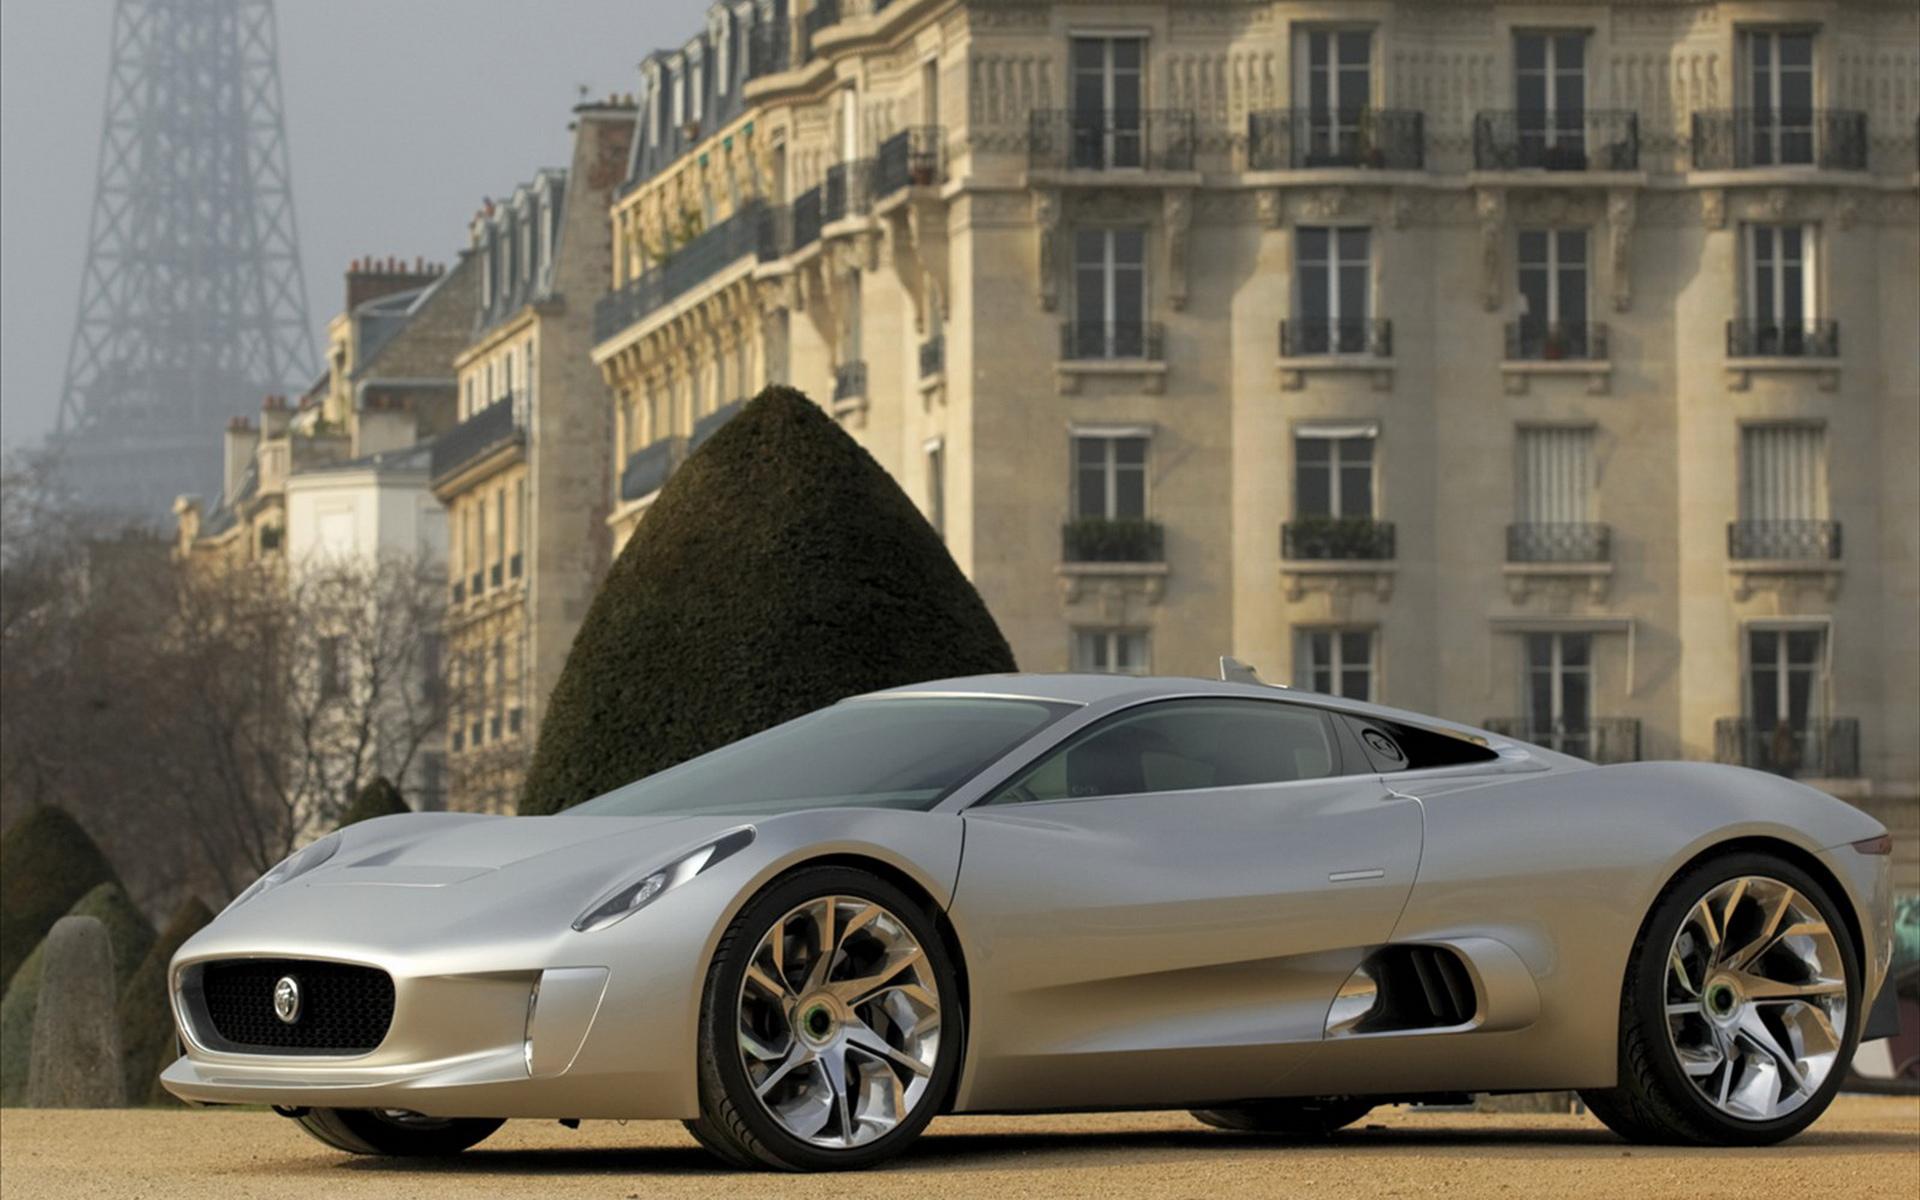 Jaguar 捷豹最新跑车电脑桌面壁纸图片